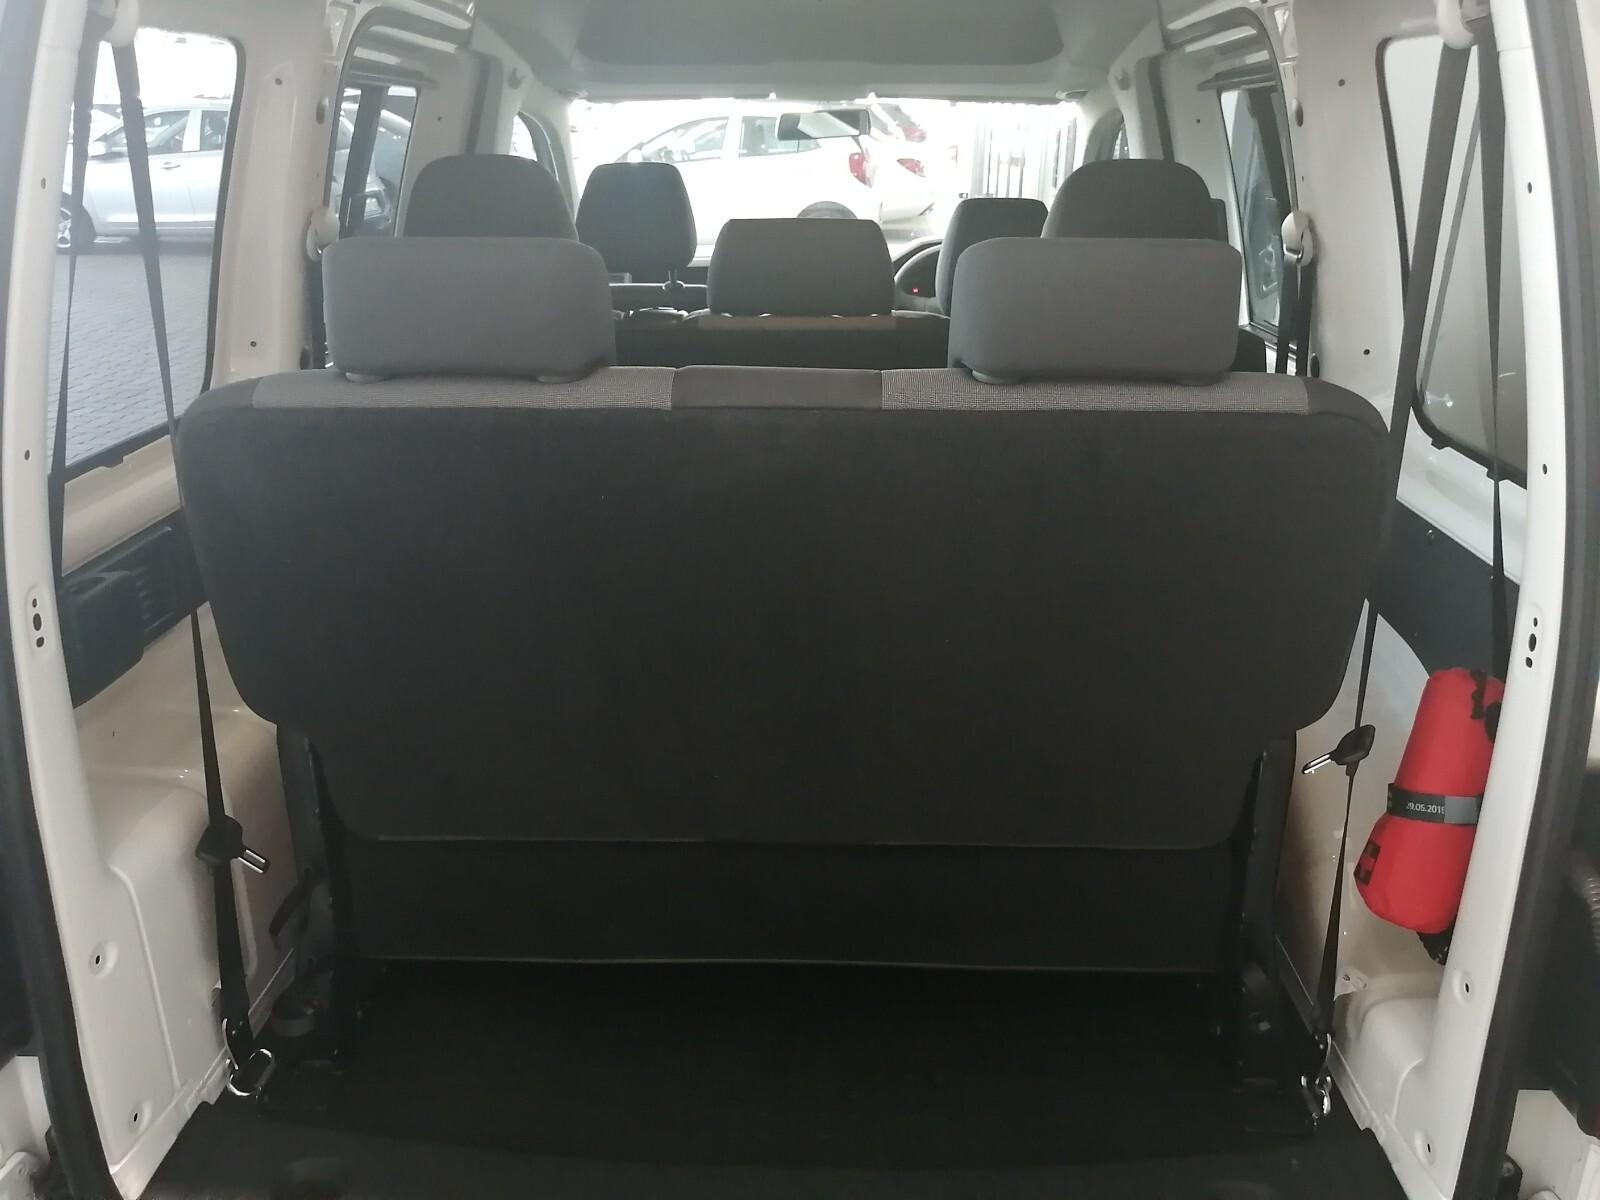 VOLKSWAGEN CREWBUS 1.6i  (7 SEAT) Benoni 15326169